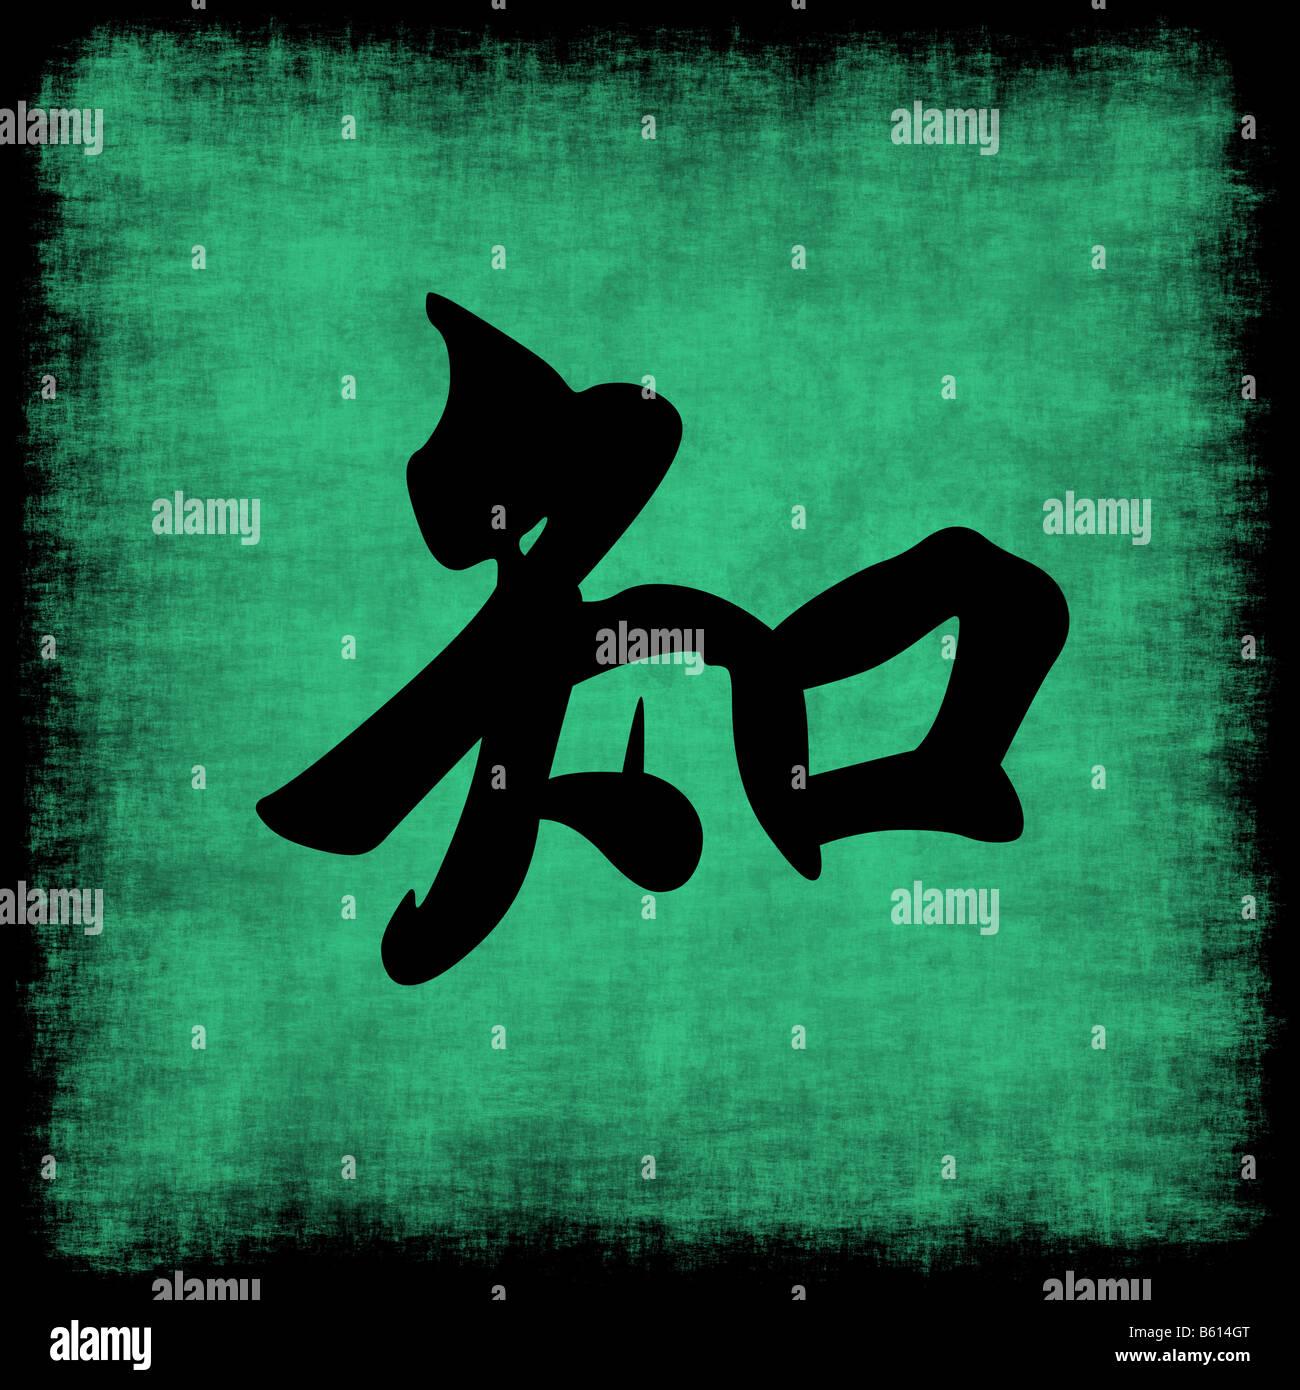 Knowledge Chinese Calligraphy Symbol Grunge Background Set Stock